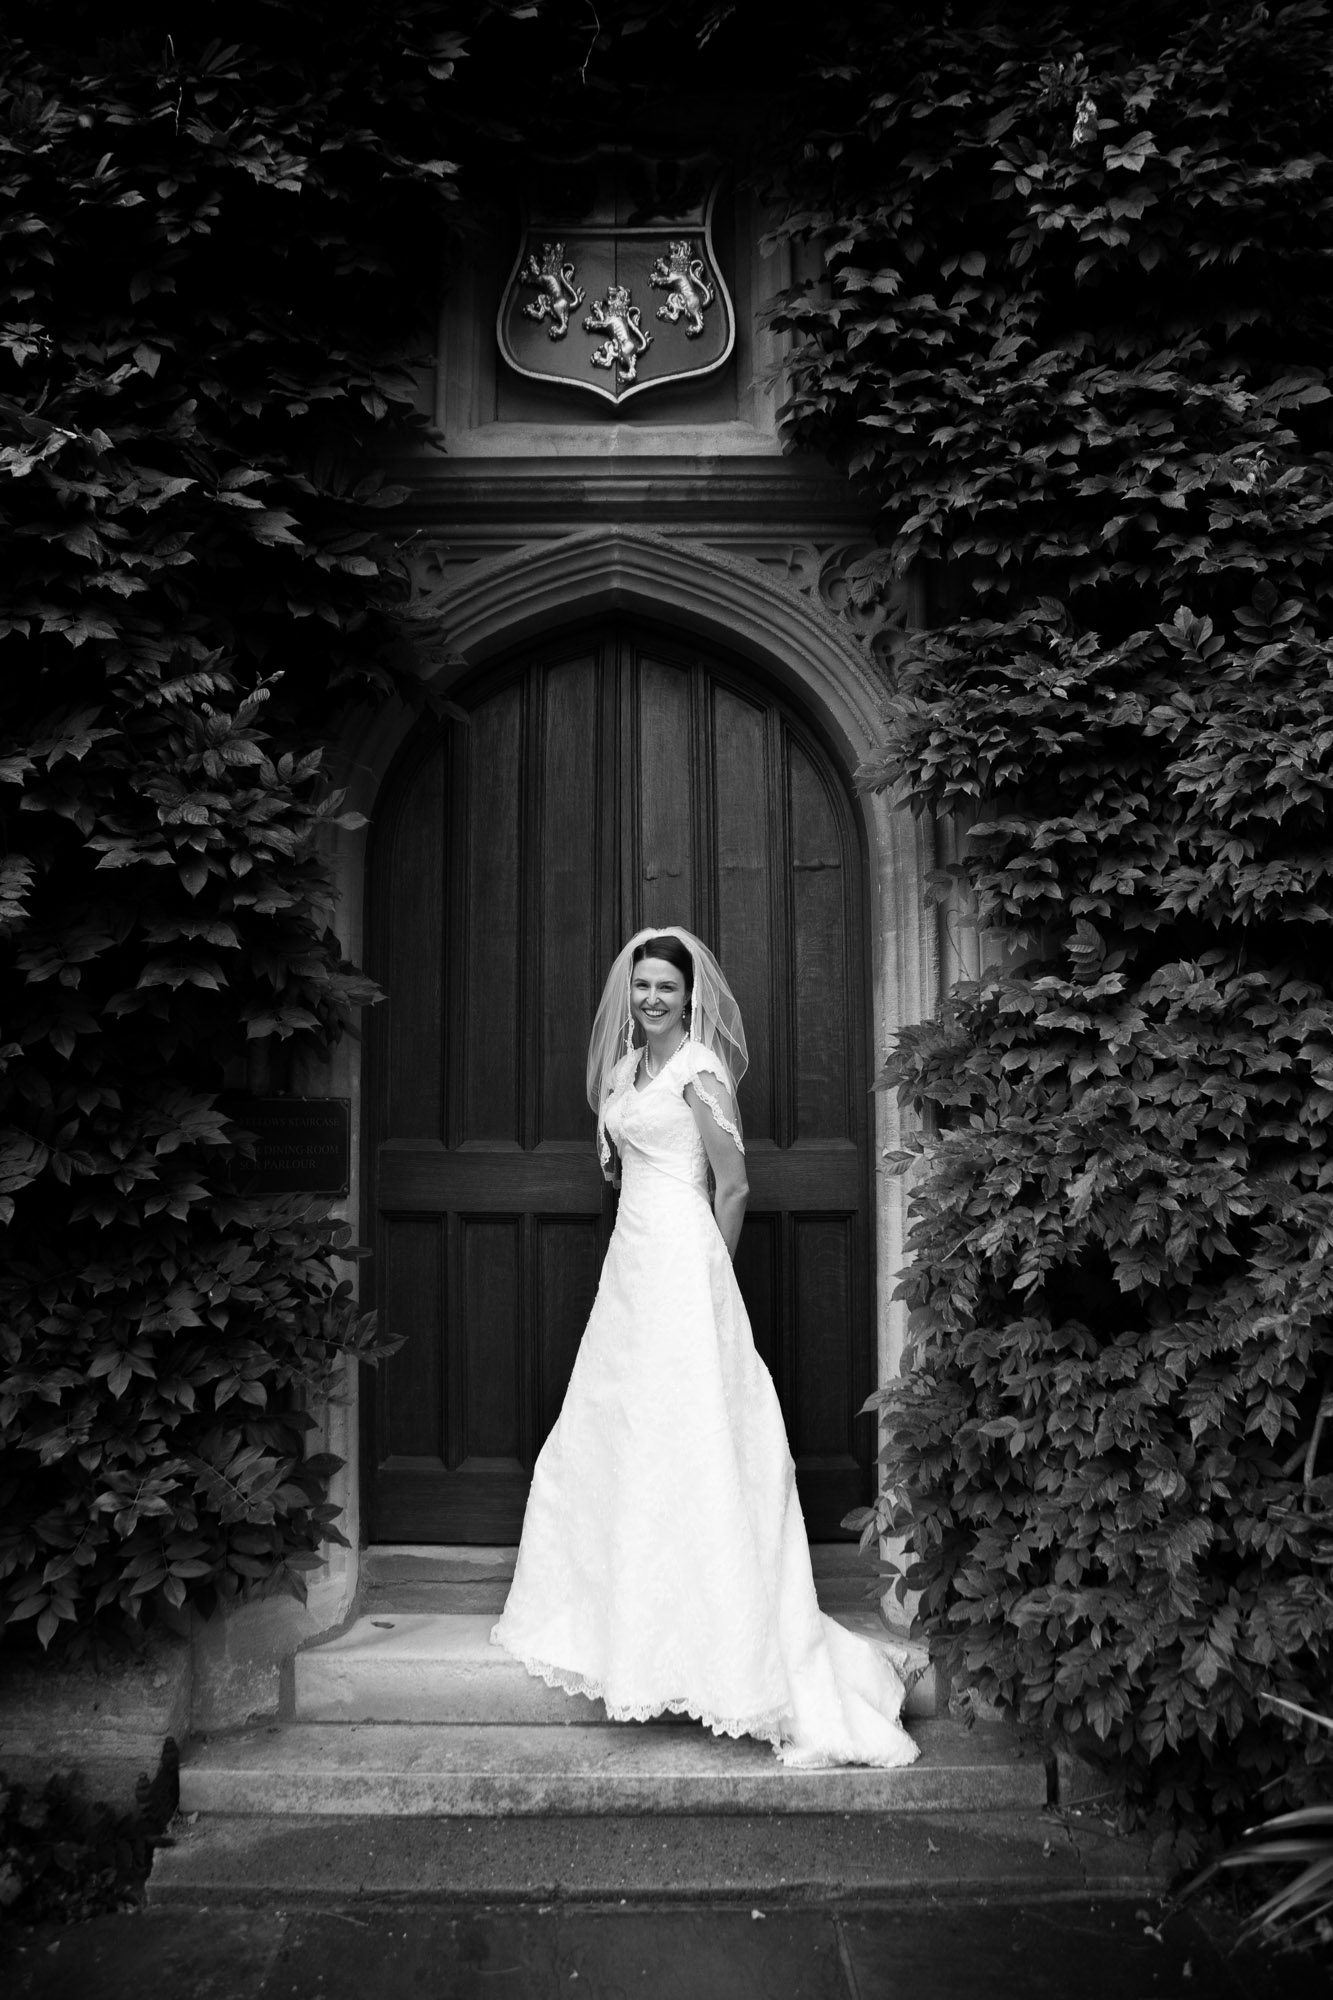 weddings-couples-love-photographer-oxford-london-jonathan-self-photography-59.jpg